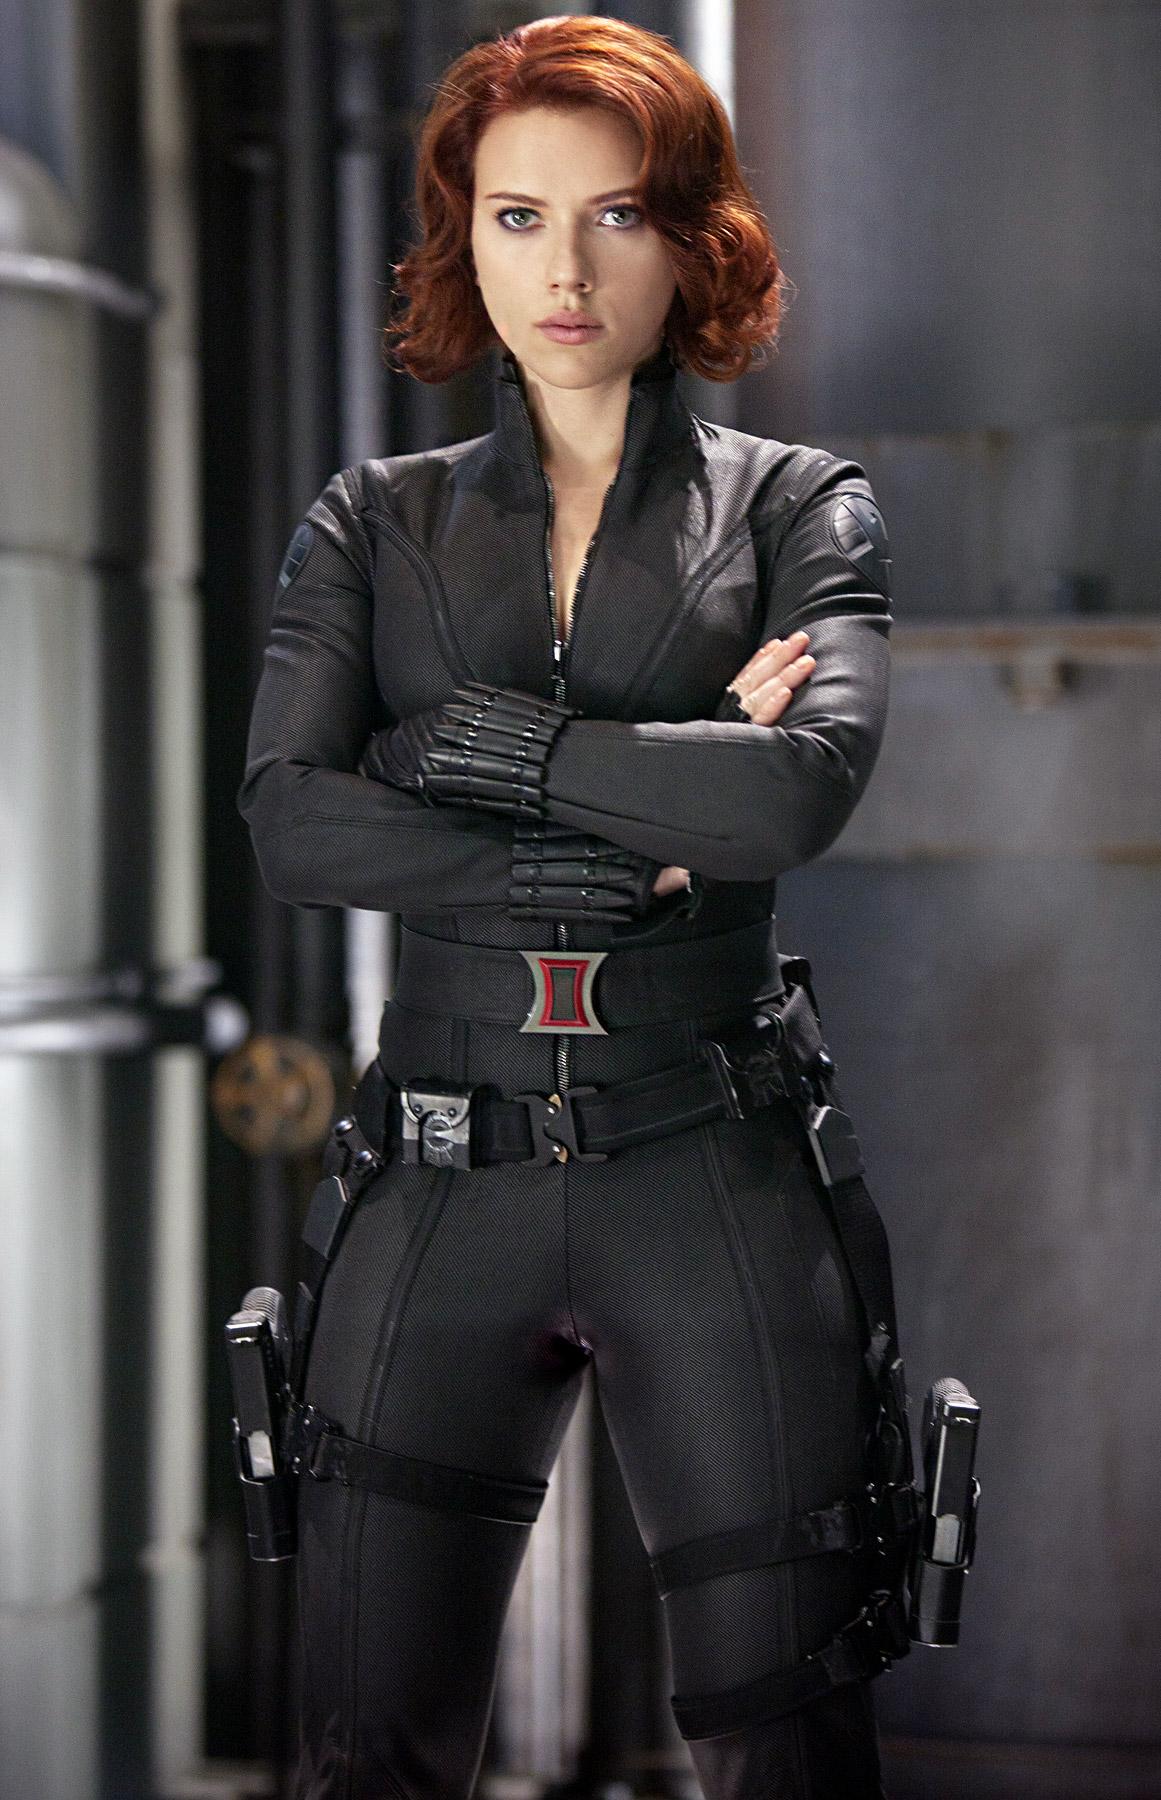 thời trang trong phim Black Widow Avengers 2012